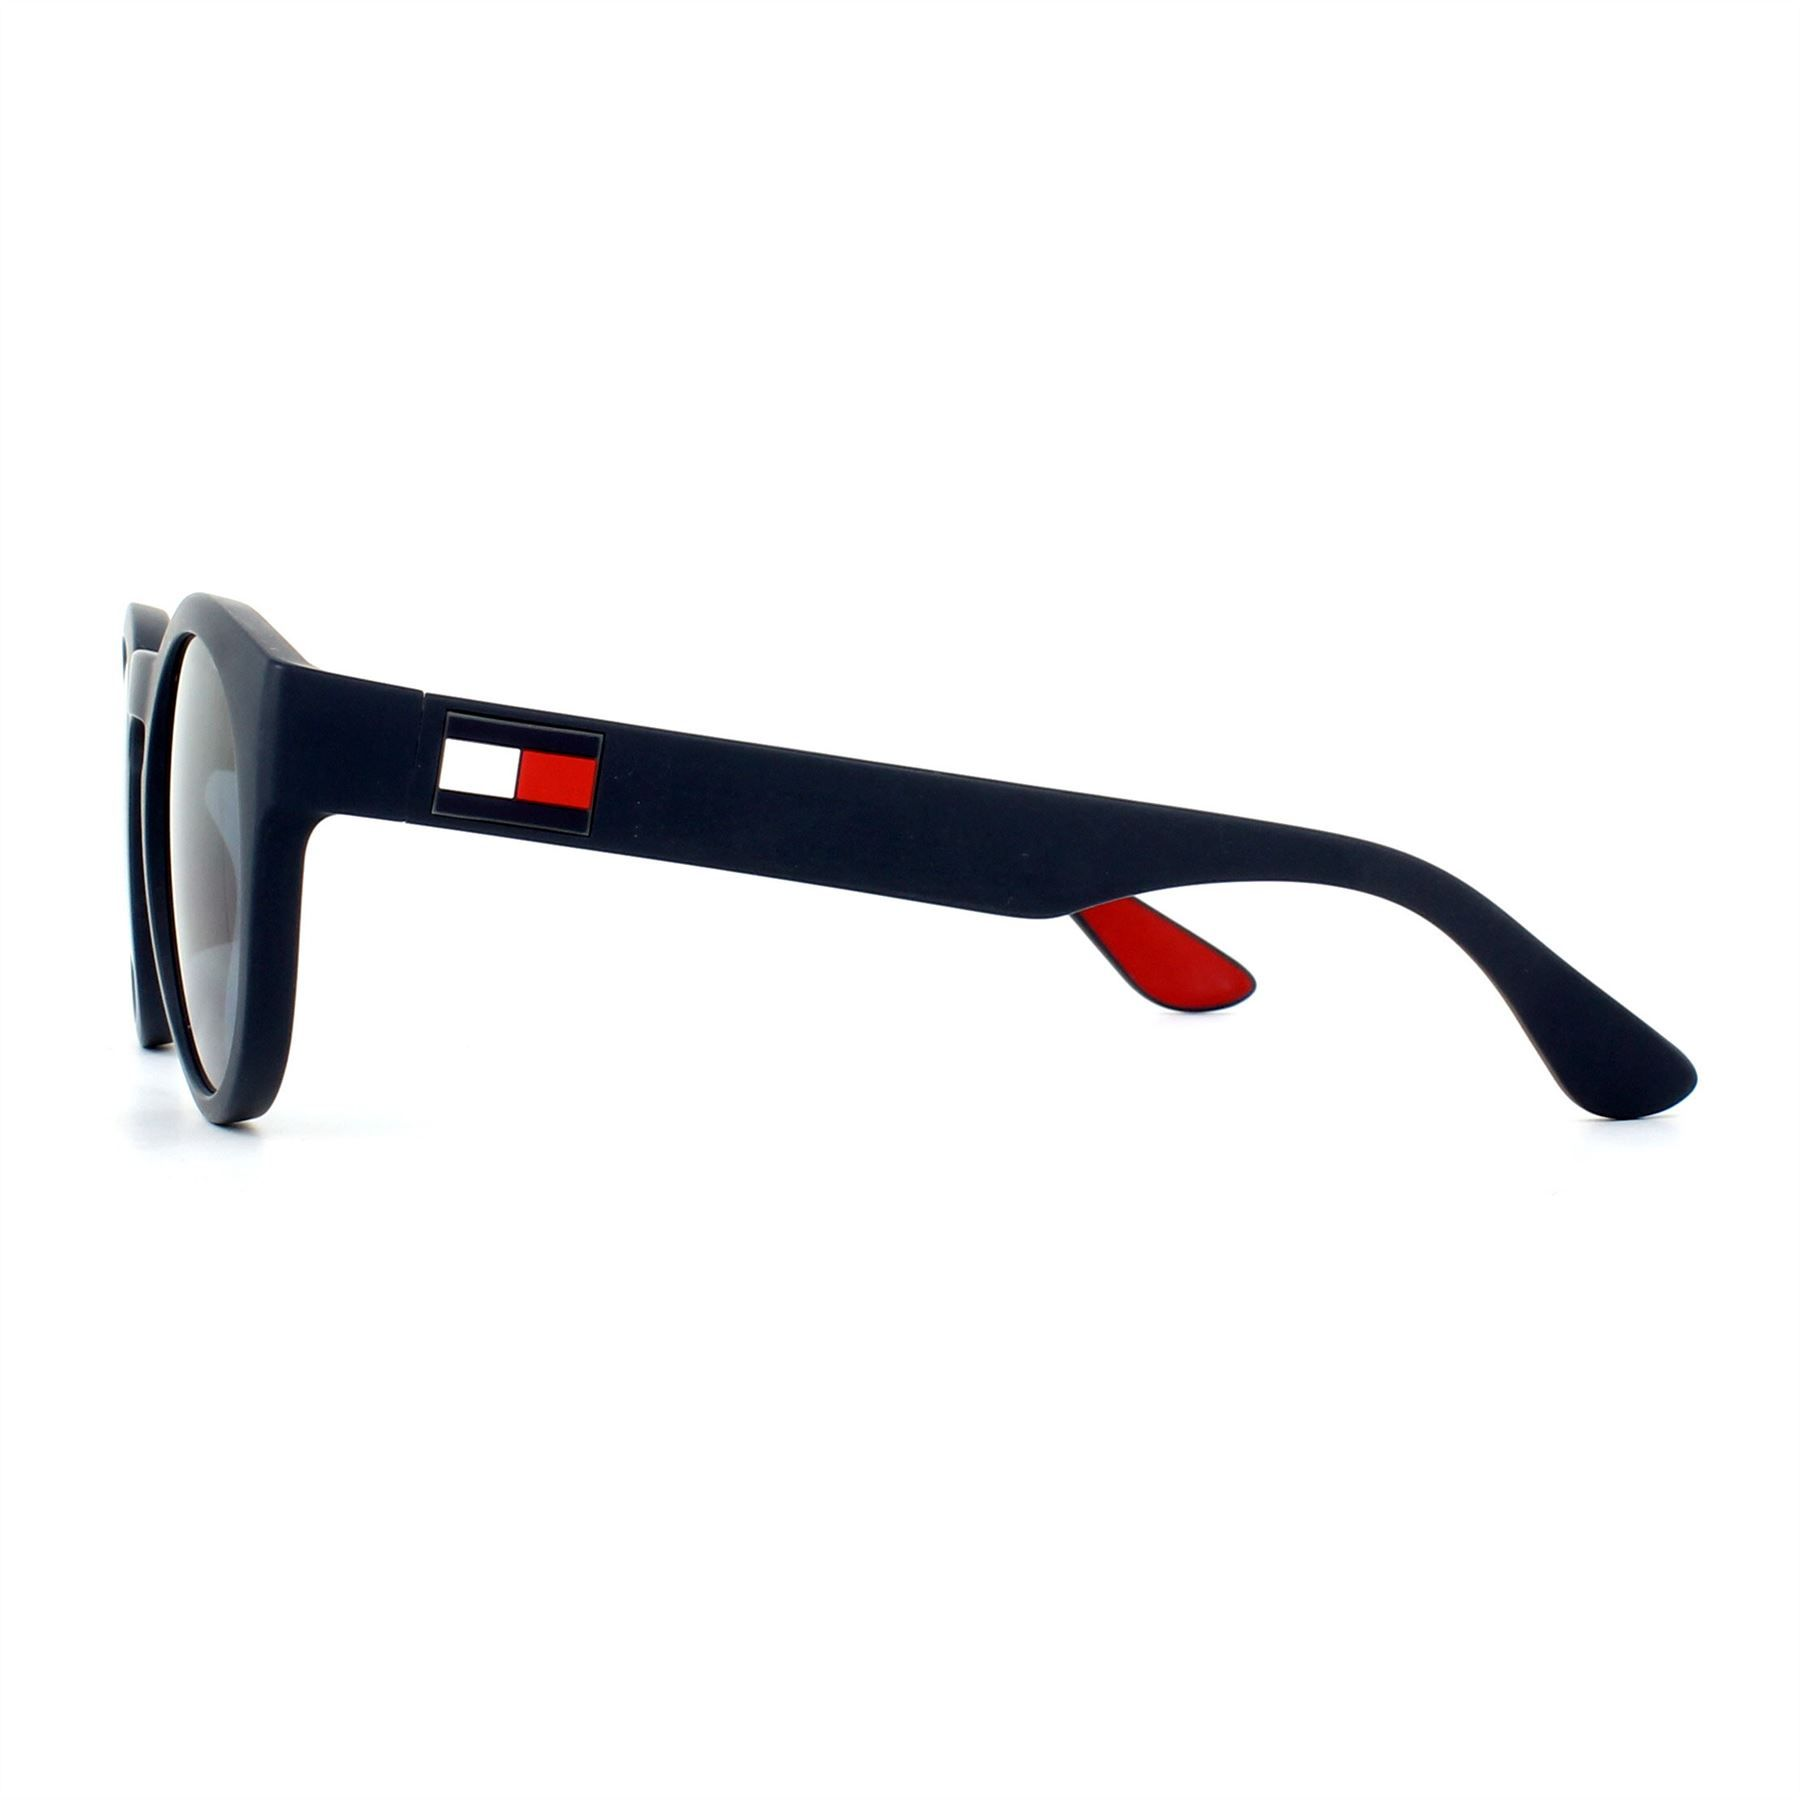 Tommy Hilfiger Sunglasses TH 1555/S 8RU KU Blue Blue